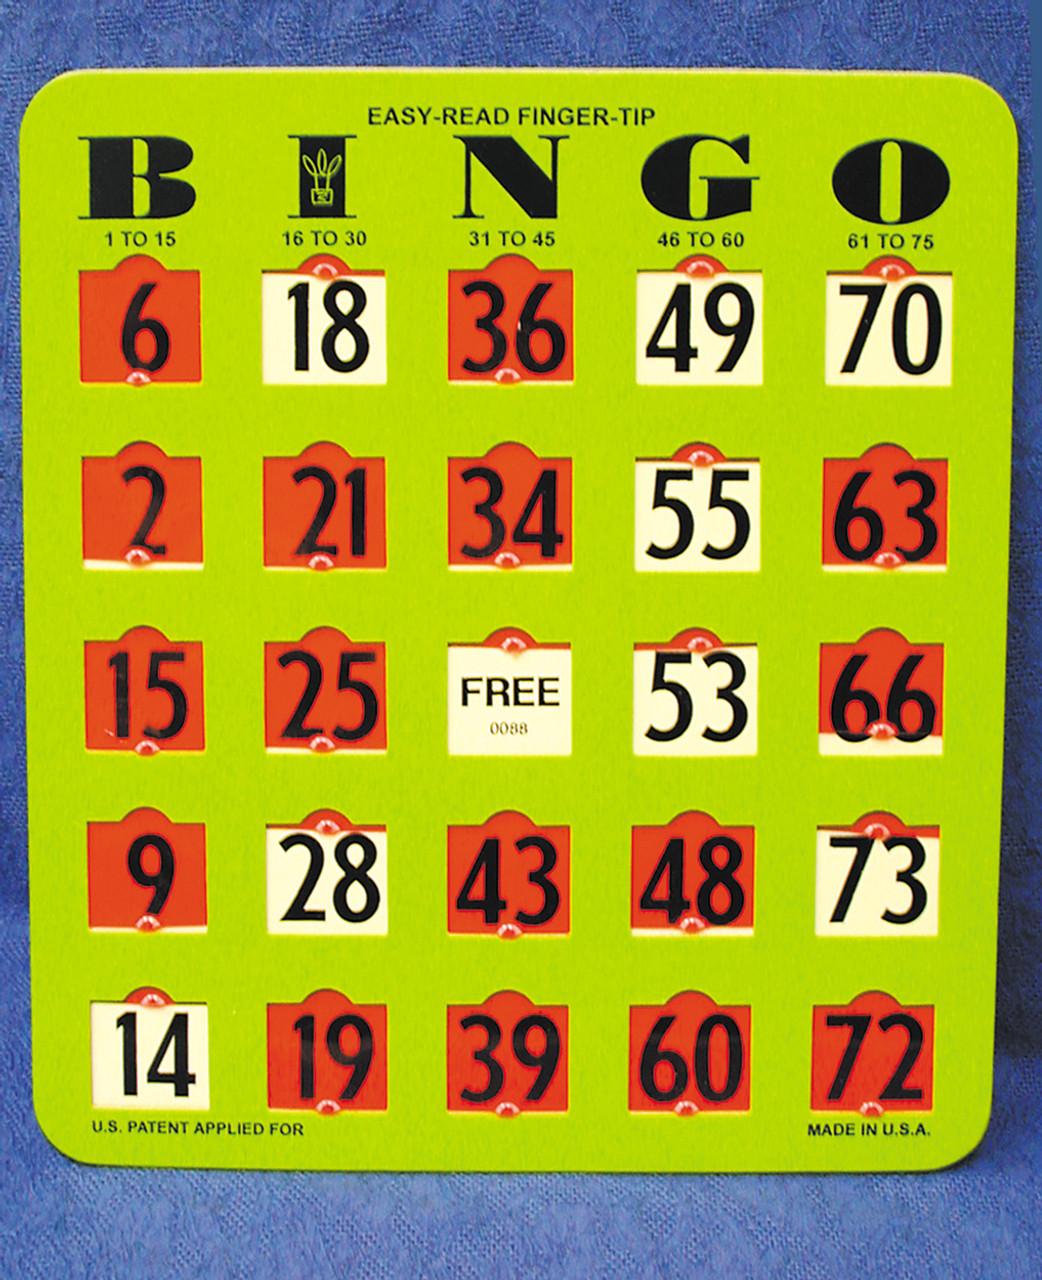 Easy-Read Finger - Tip Bingo Cards